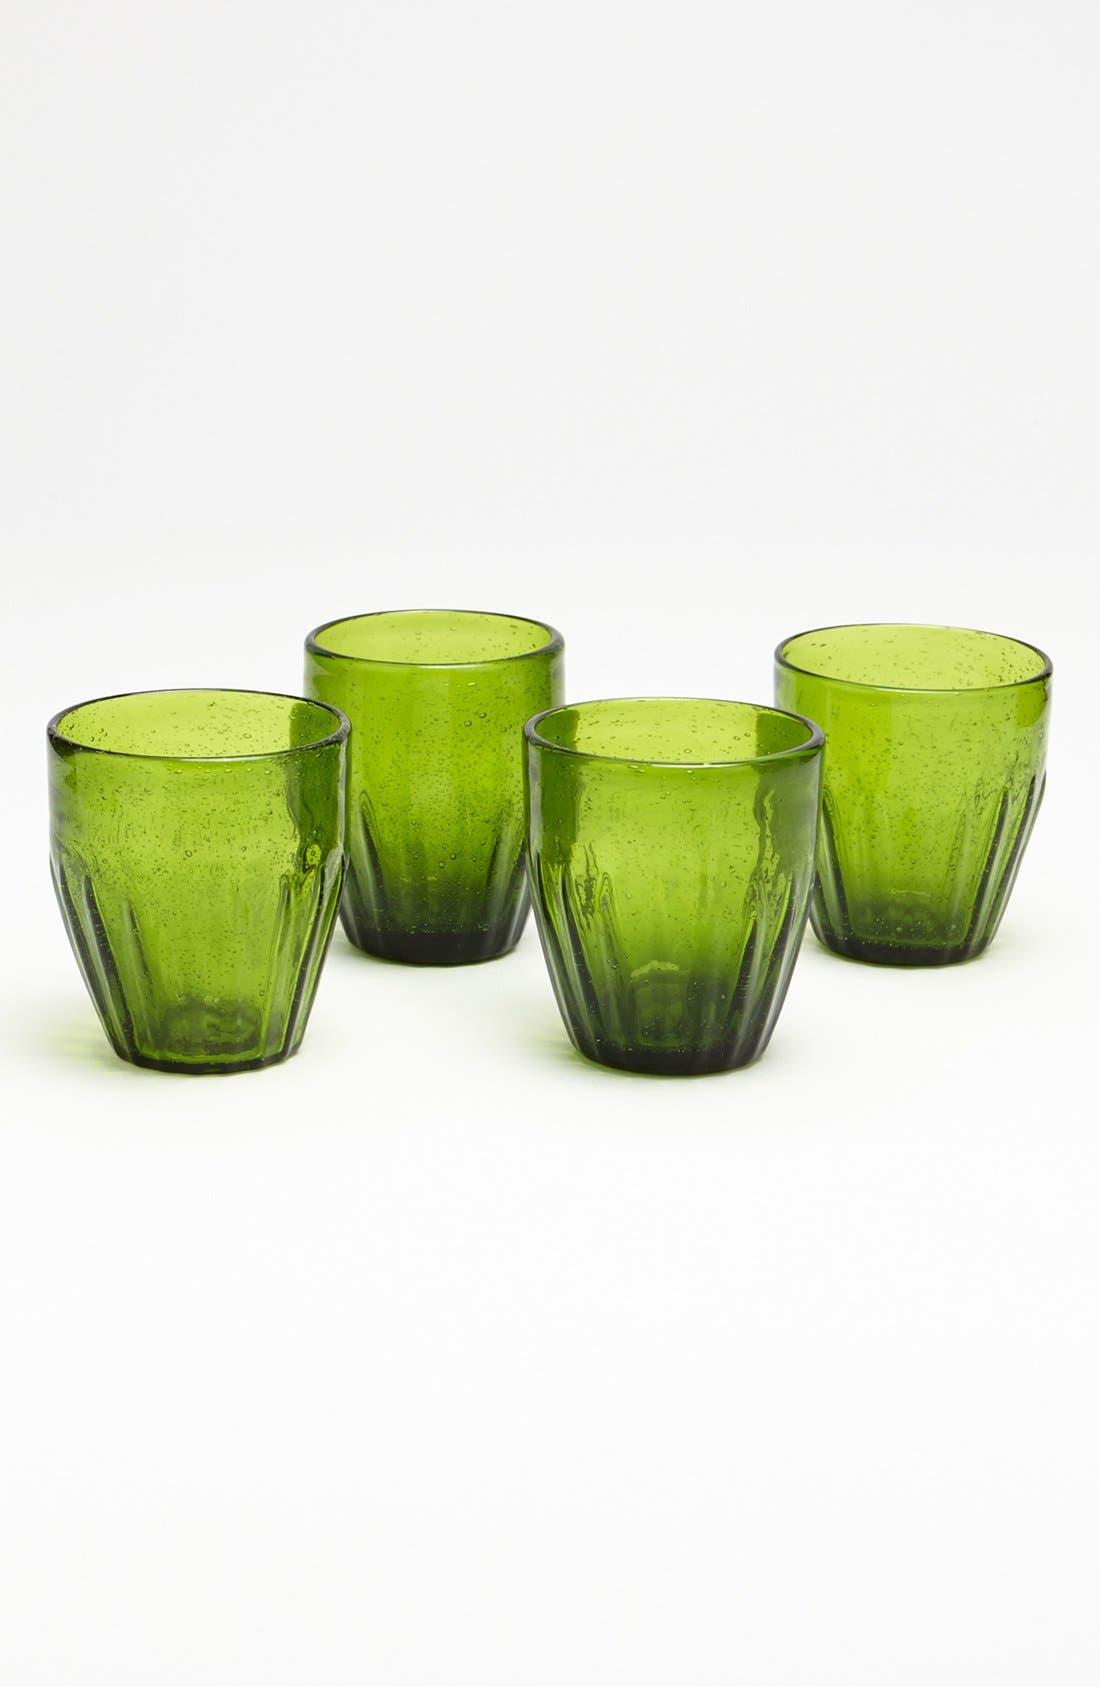 Alternate Image 1 Selected - Rustic Green Glass Tumblers (Set of 4)